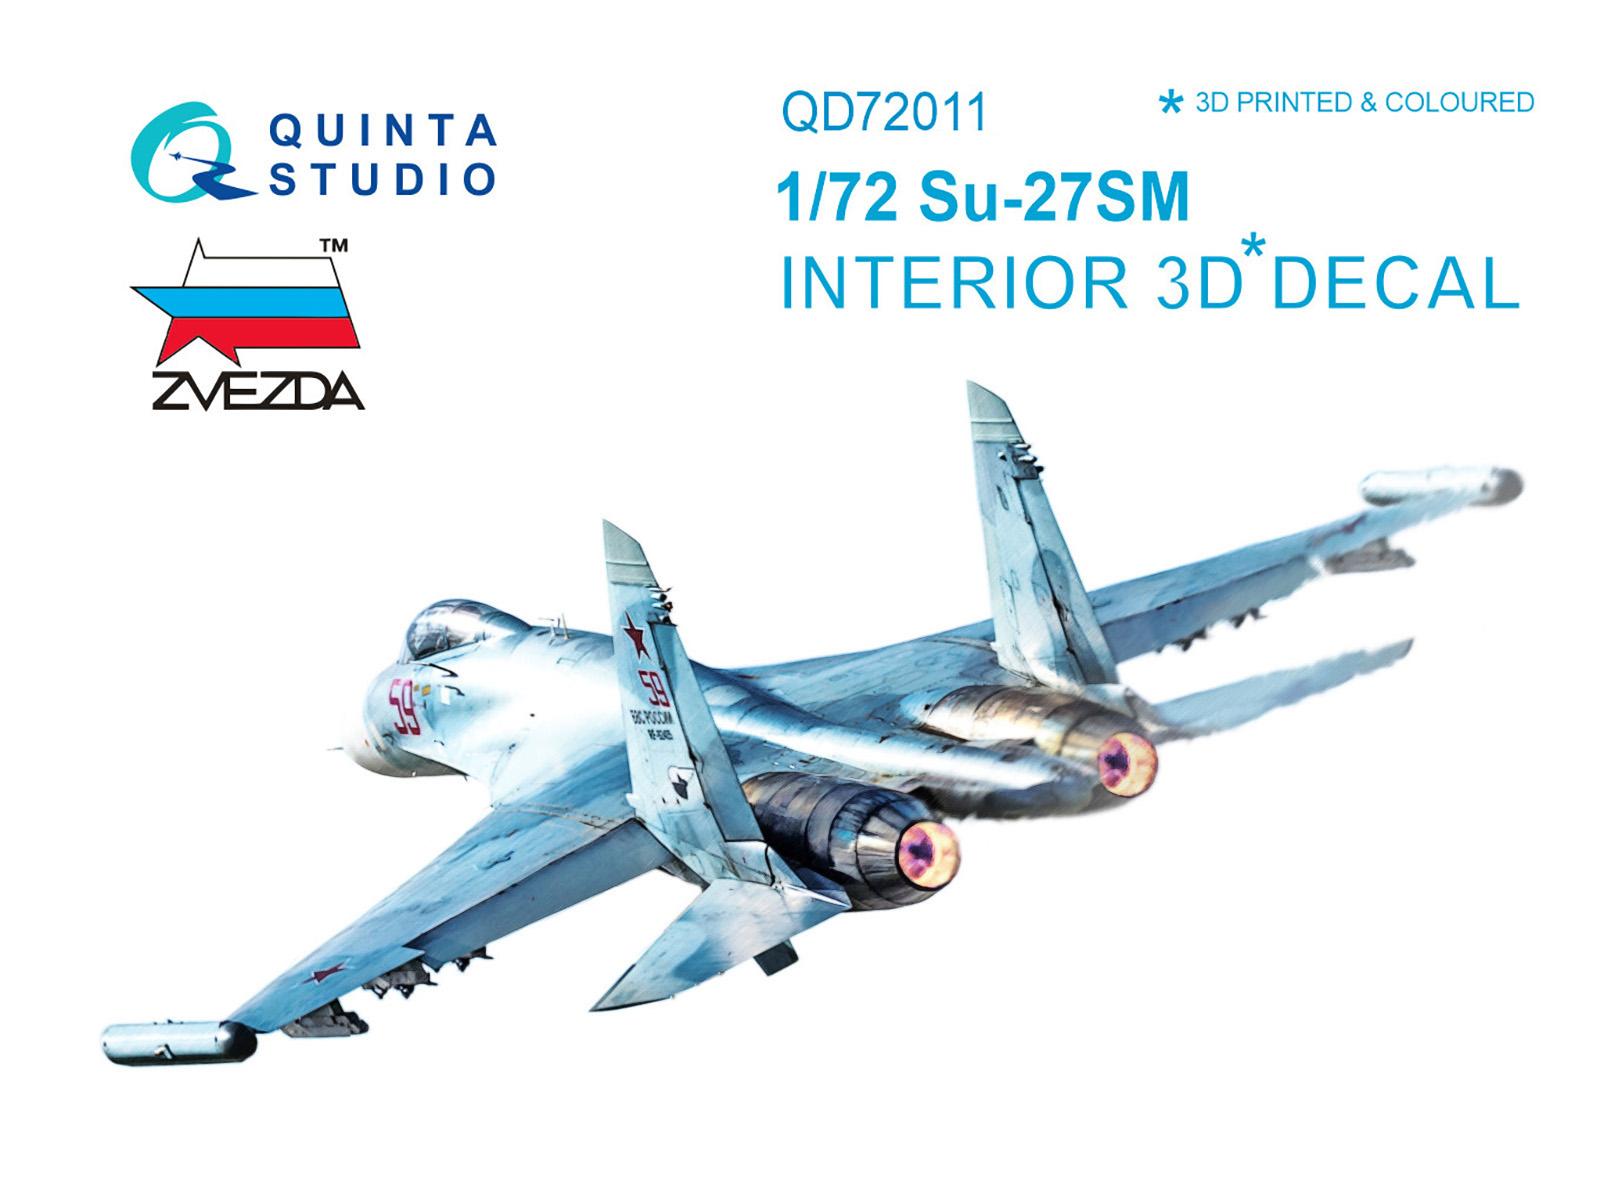 QD72011